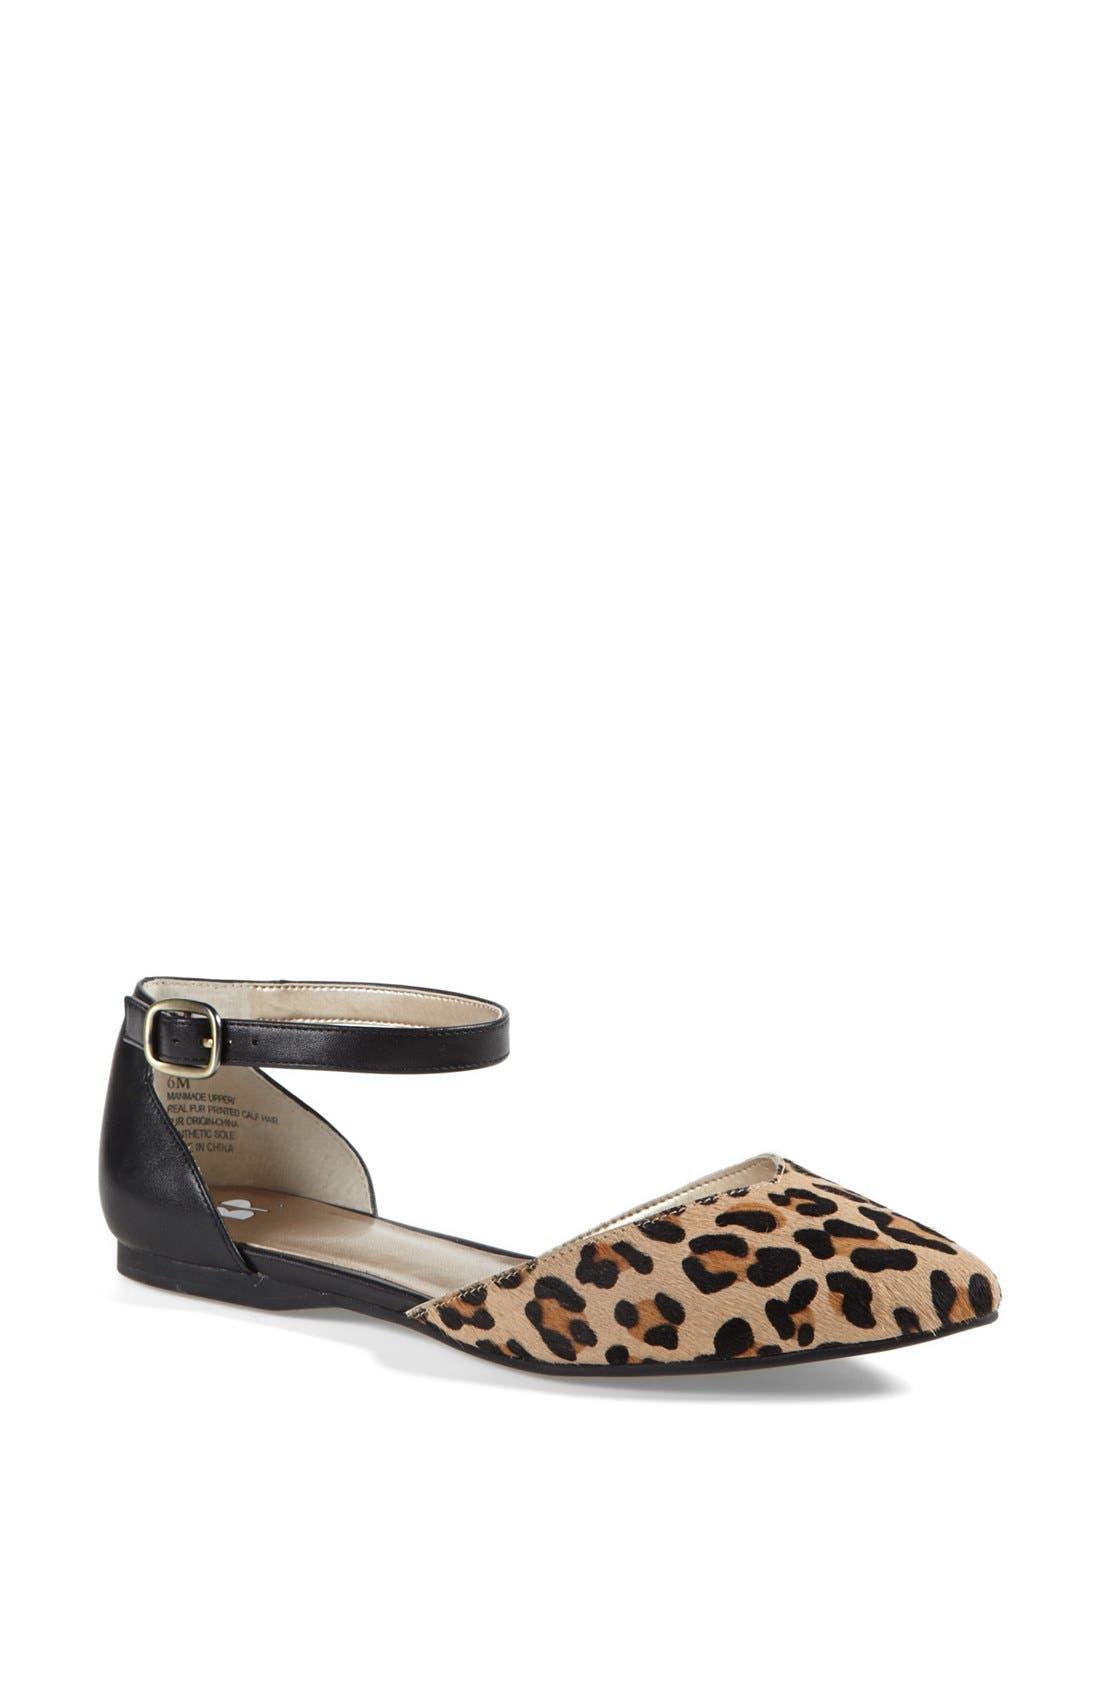 Main Image - BP. 'Gillie' Ankle Strap Flat